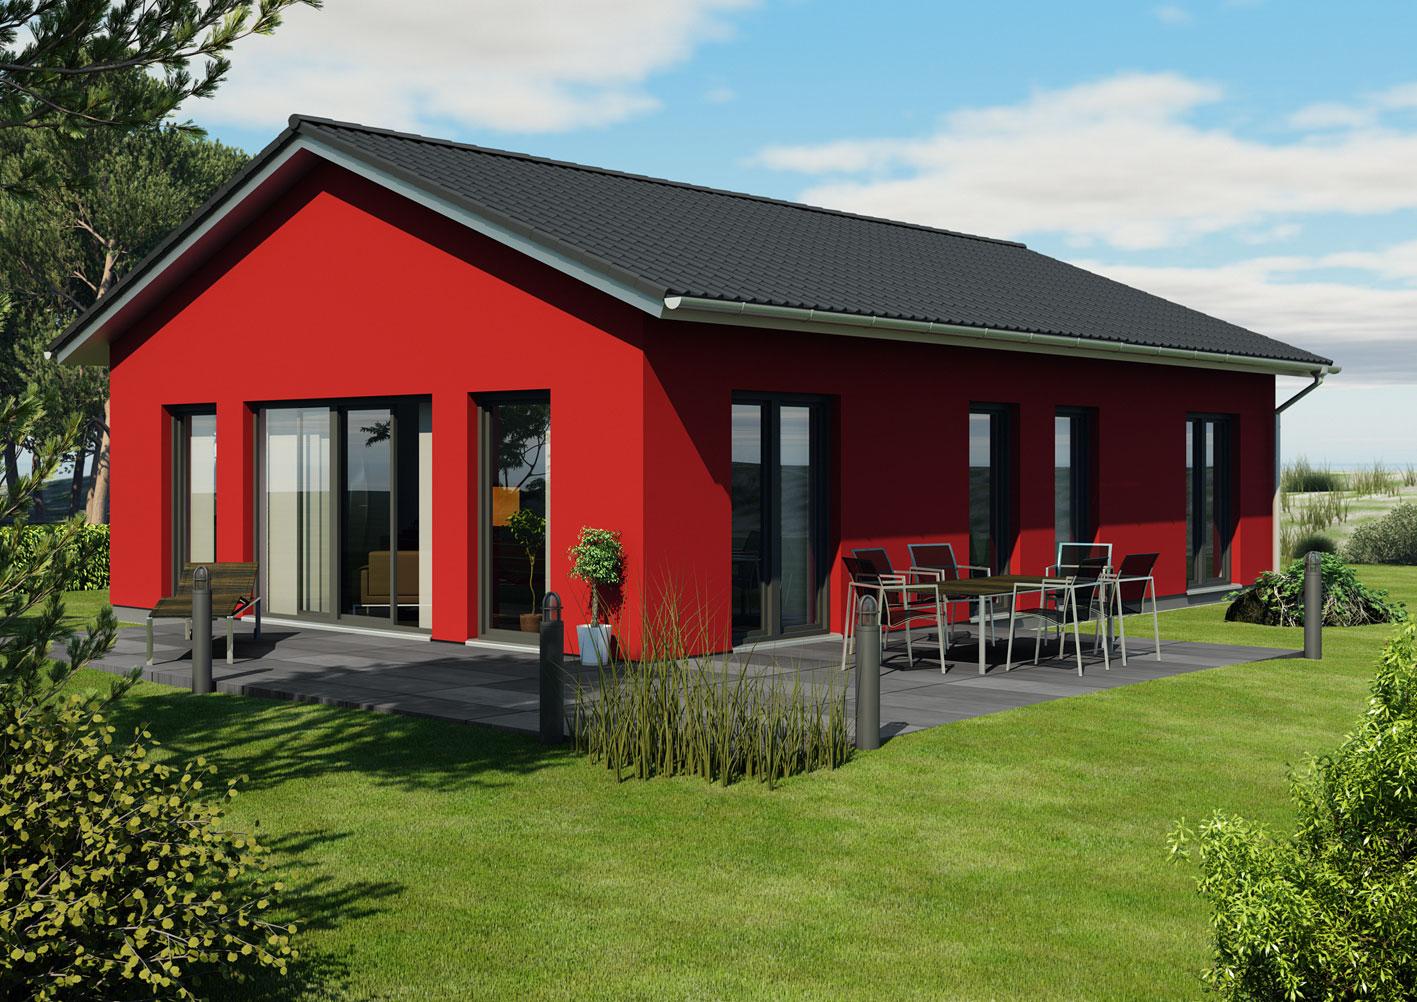 Proiecte de case bungalow casa i gr dina for Case modulari in stile bungalow